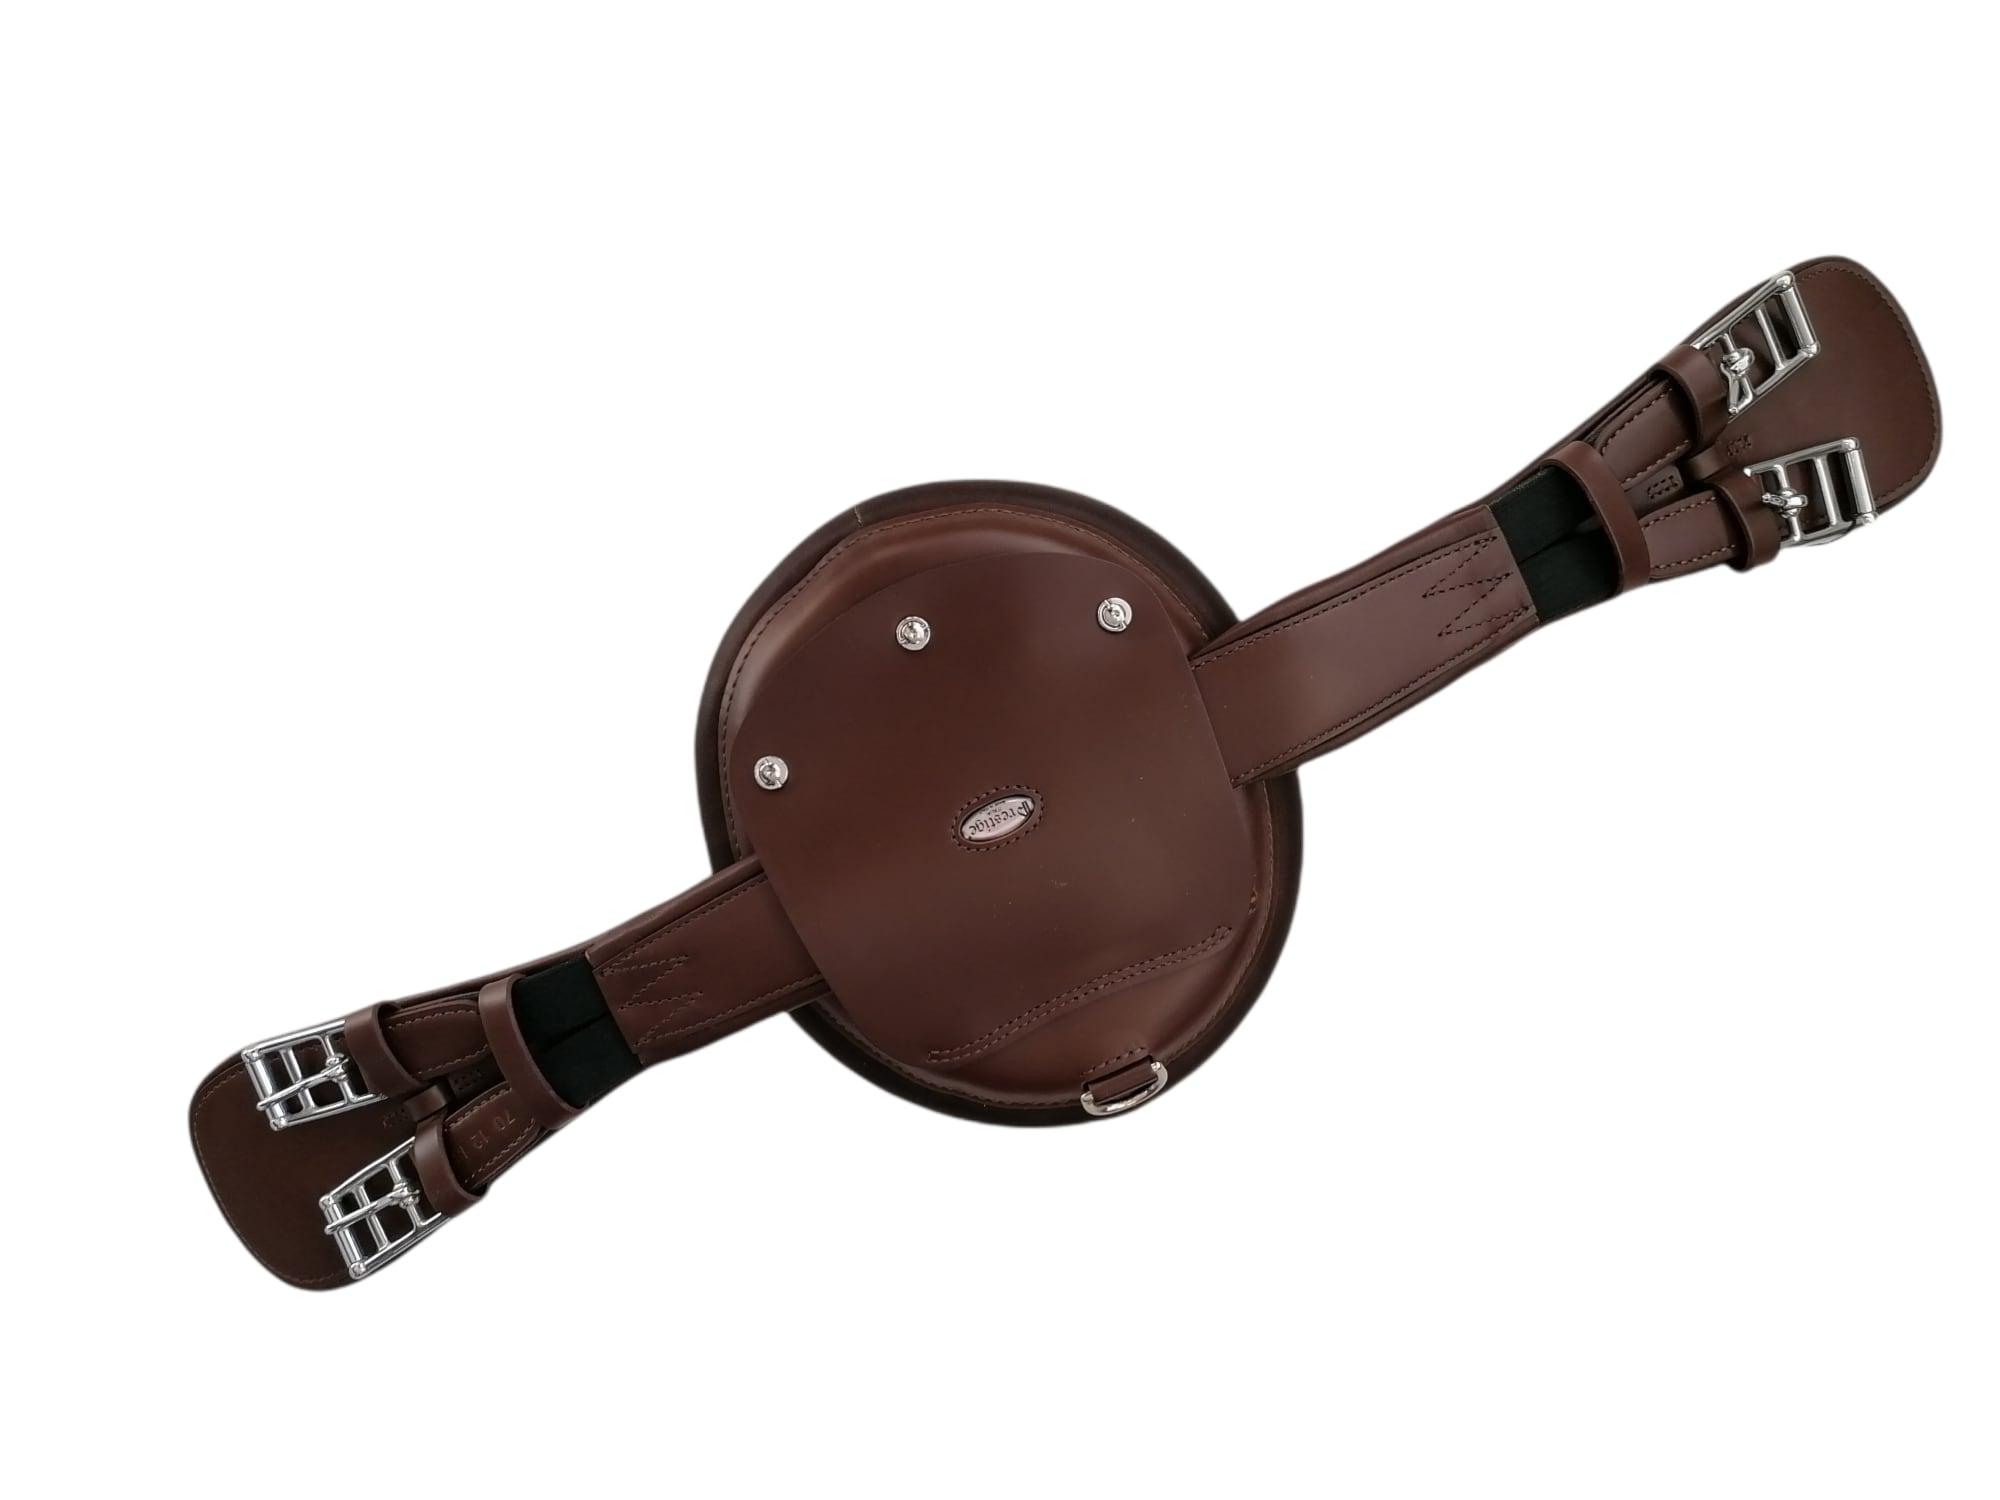 RP dressage girth - Brown